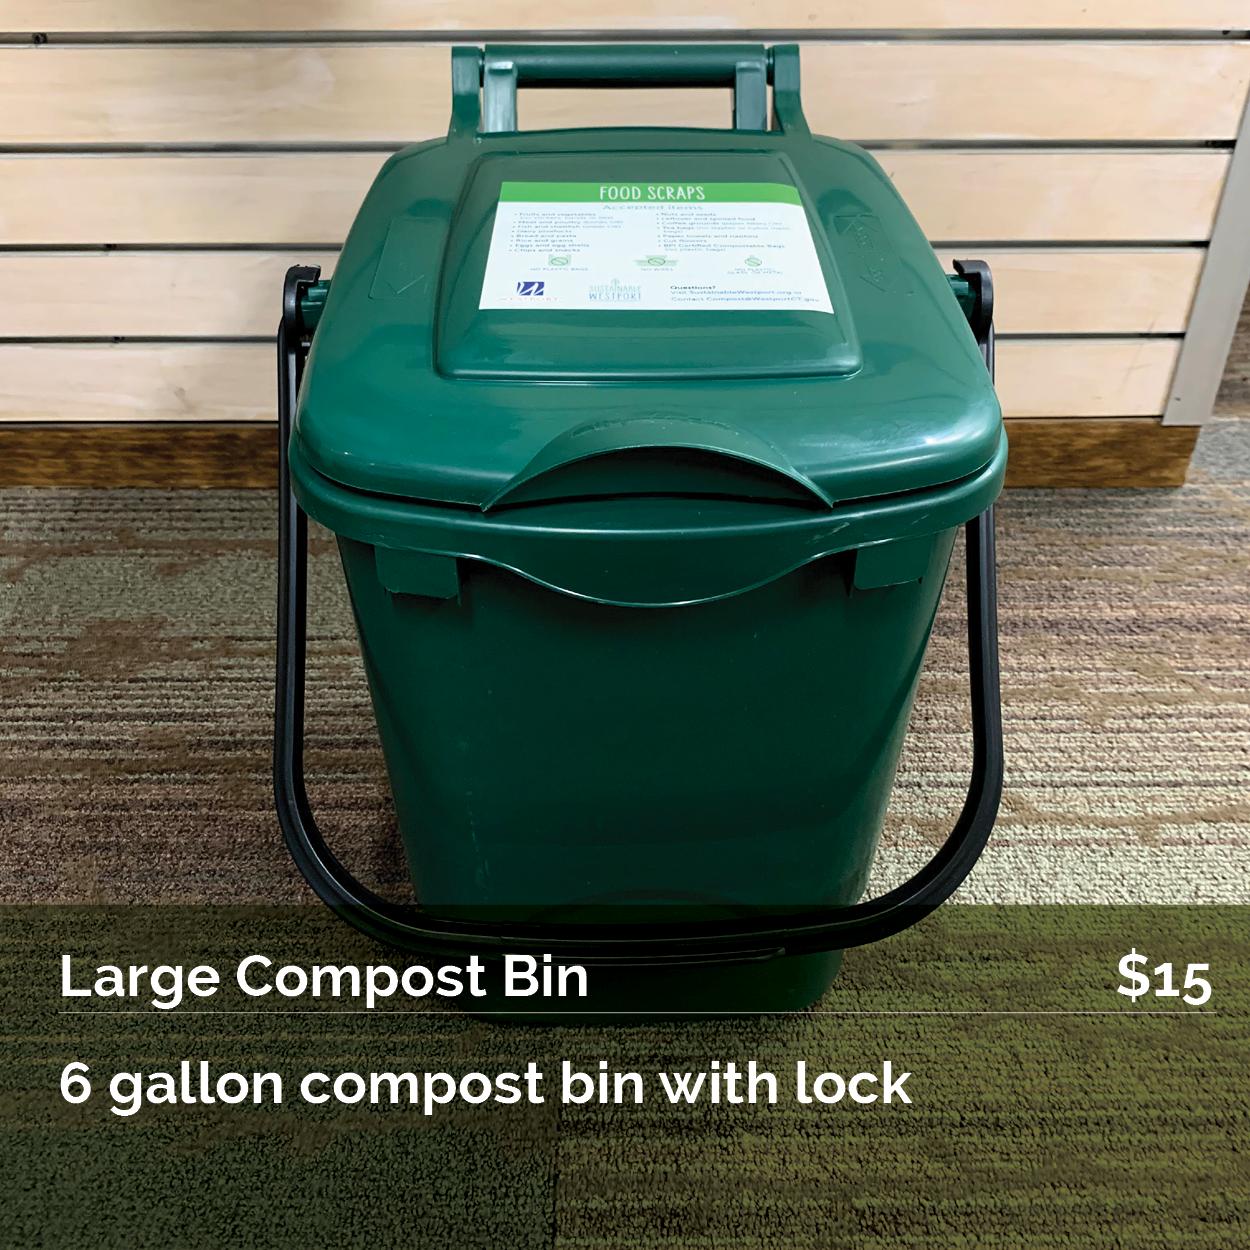 Large 6-gallon Compost Bin